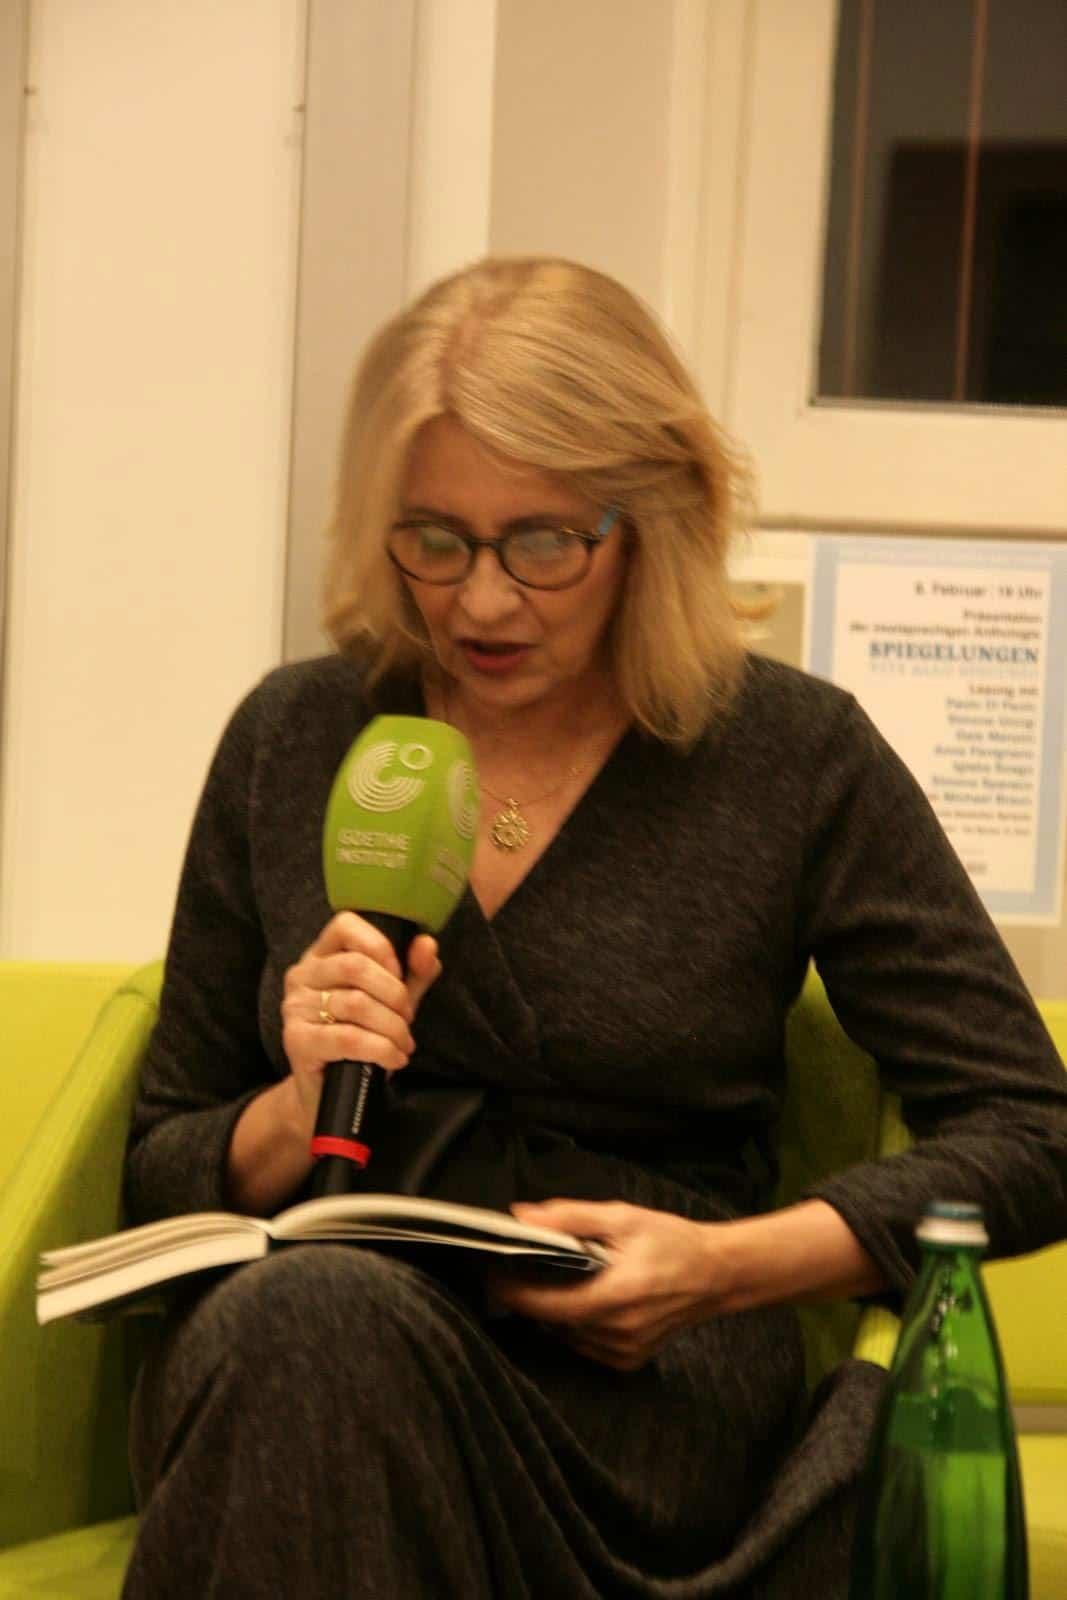 Anna Pavignano am Lesen